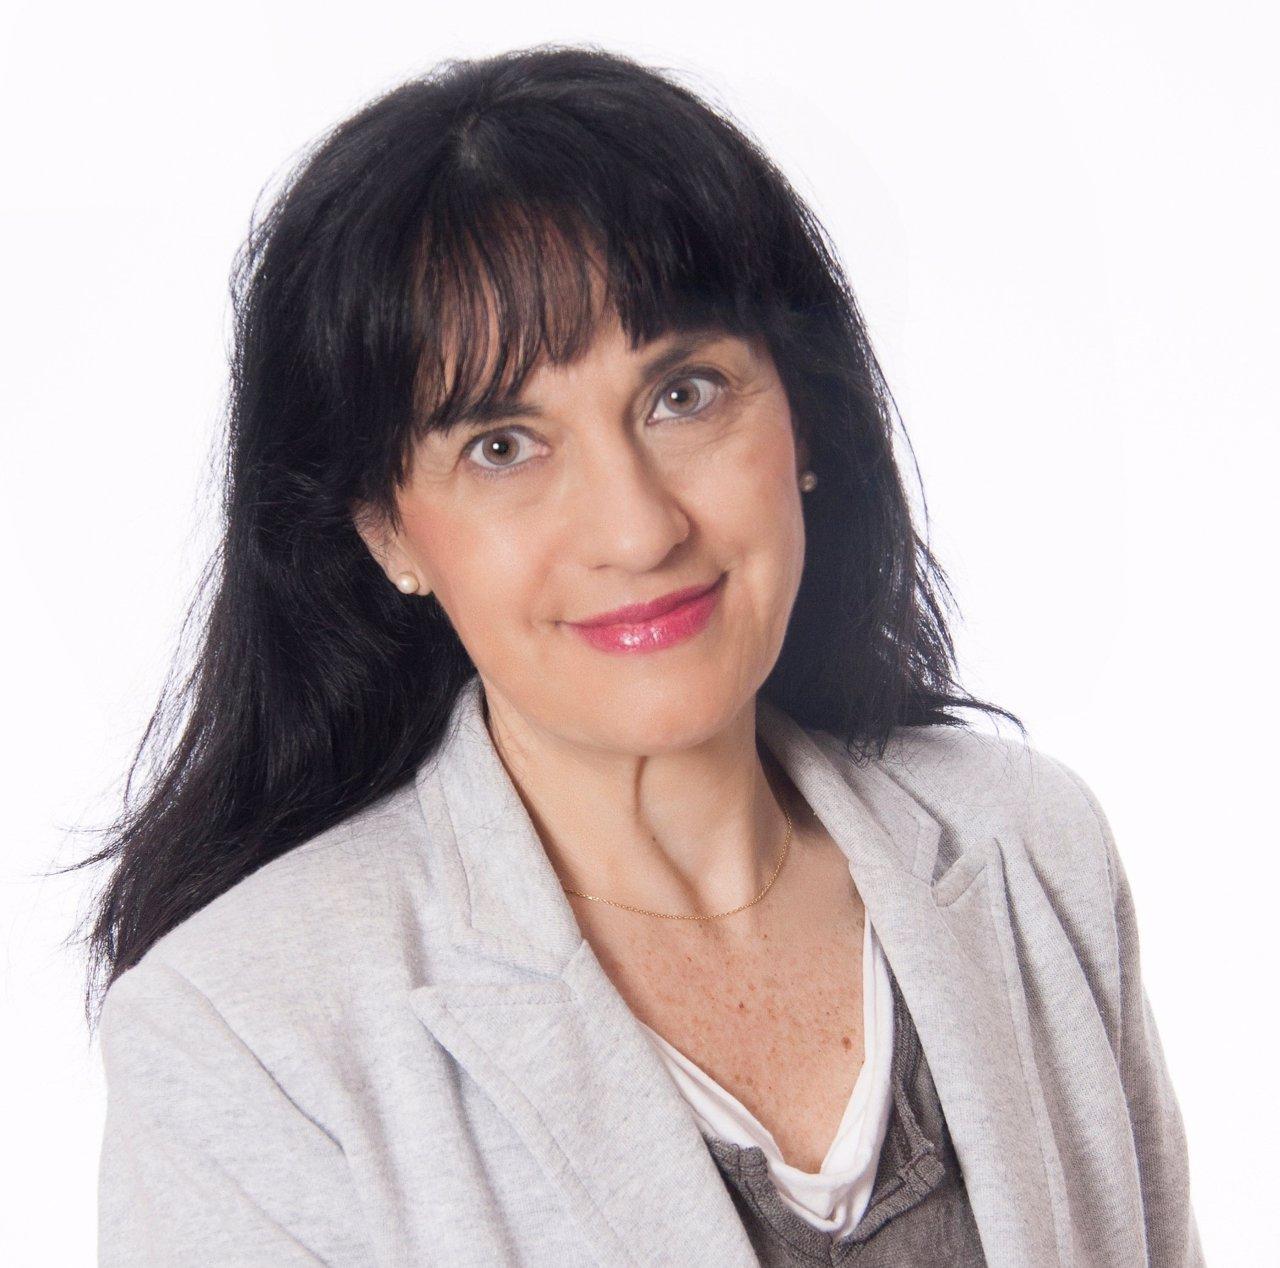 Nuria Lorite